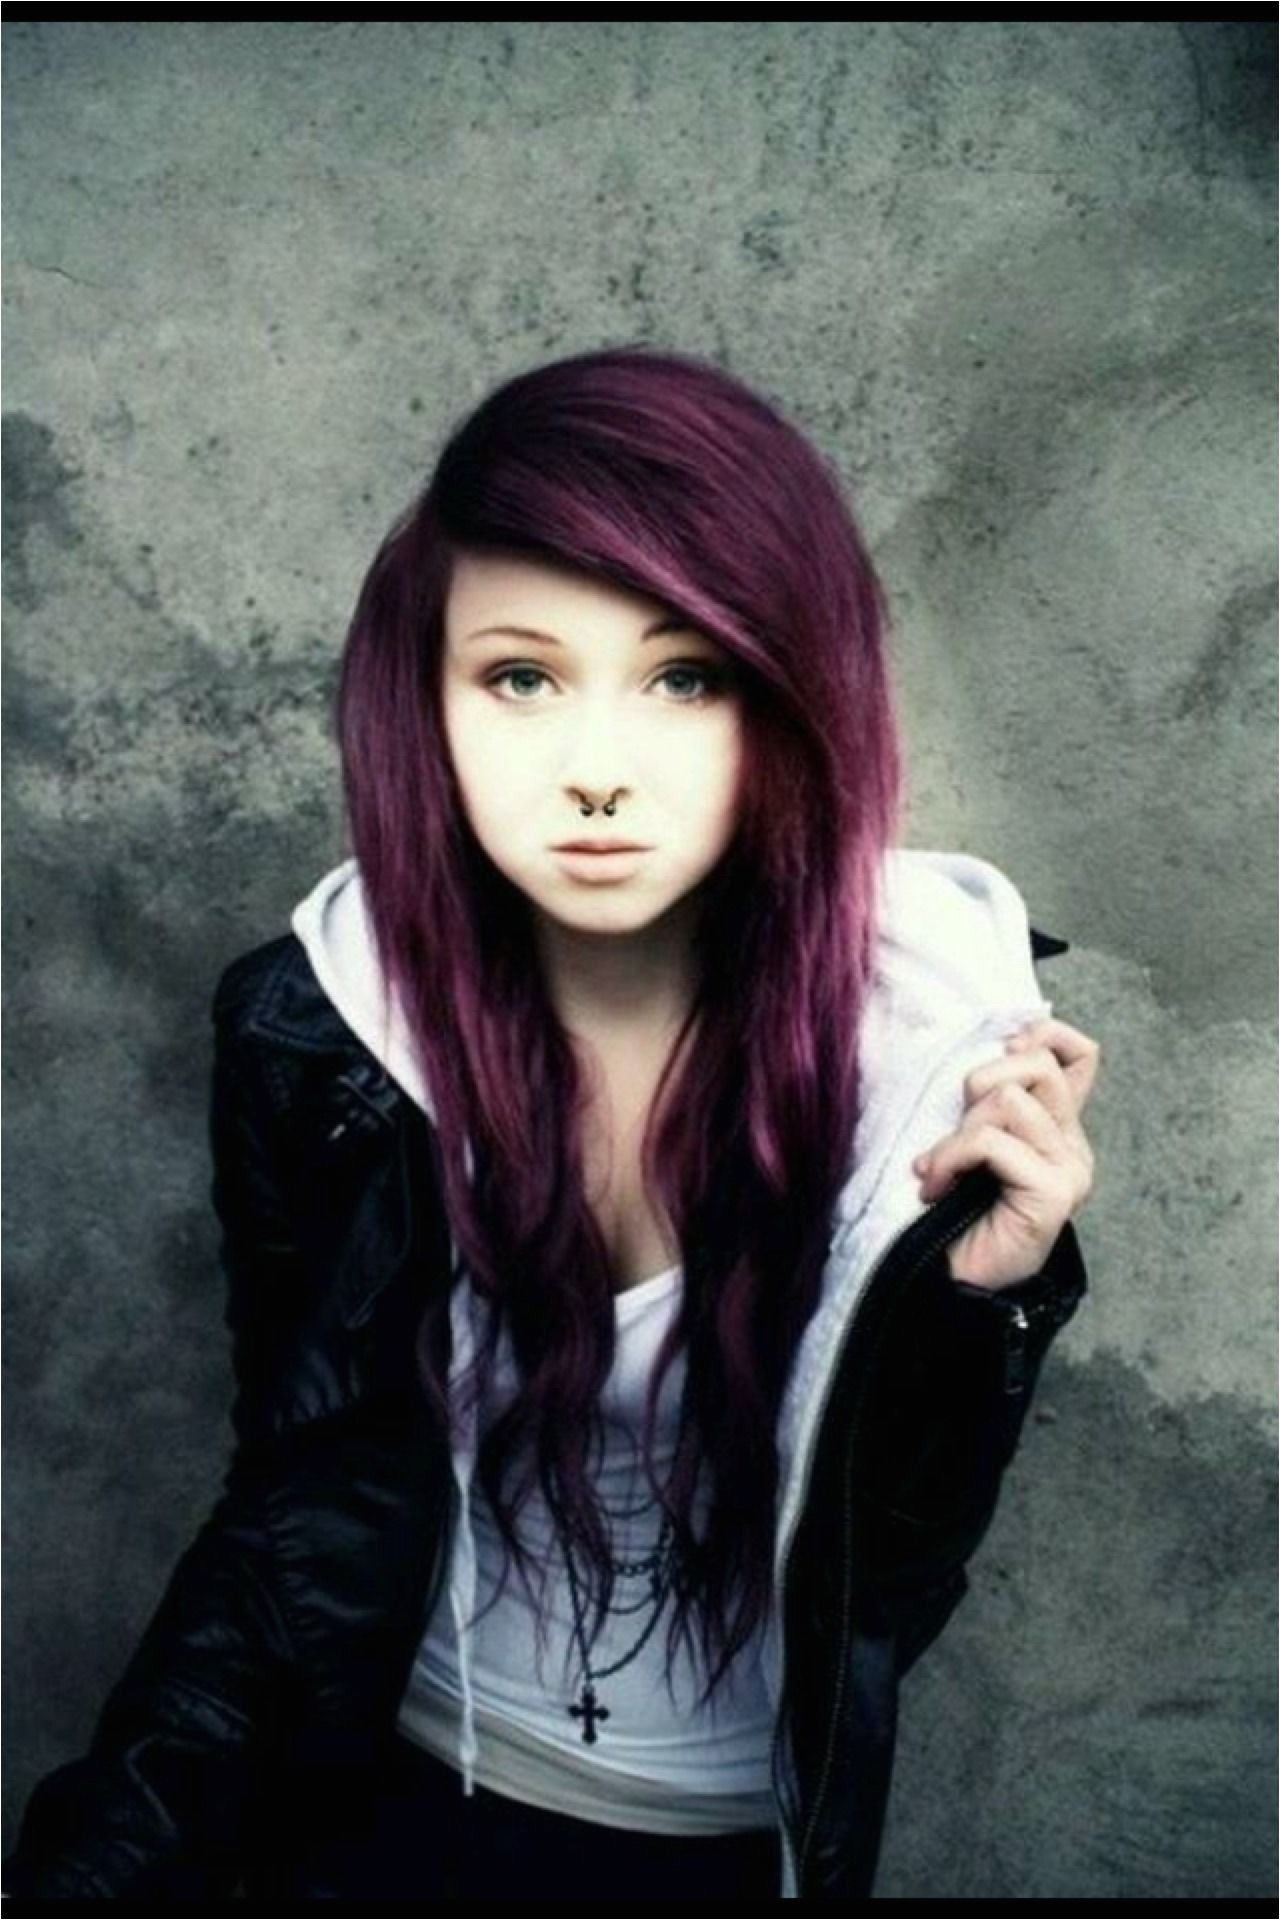 emo hair styles | hairstyle ideas | emo hair, hair styles, hair